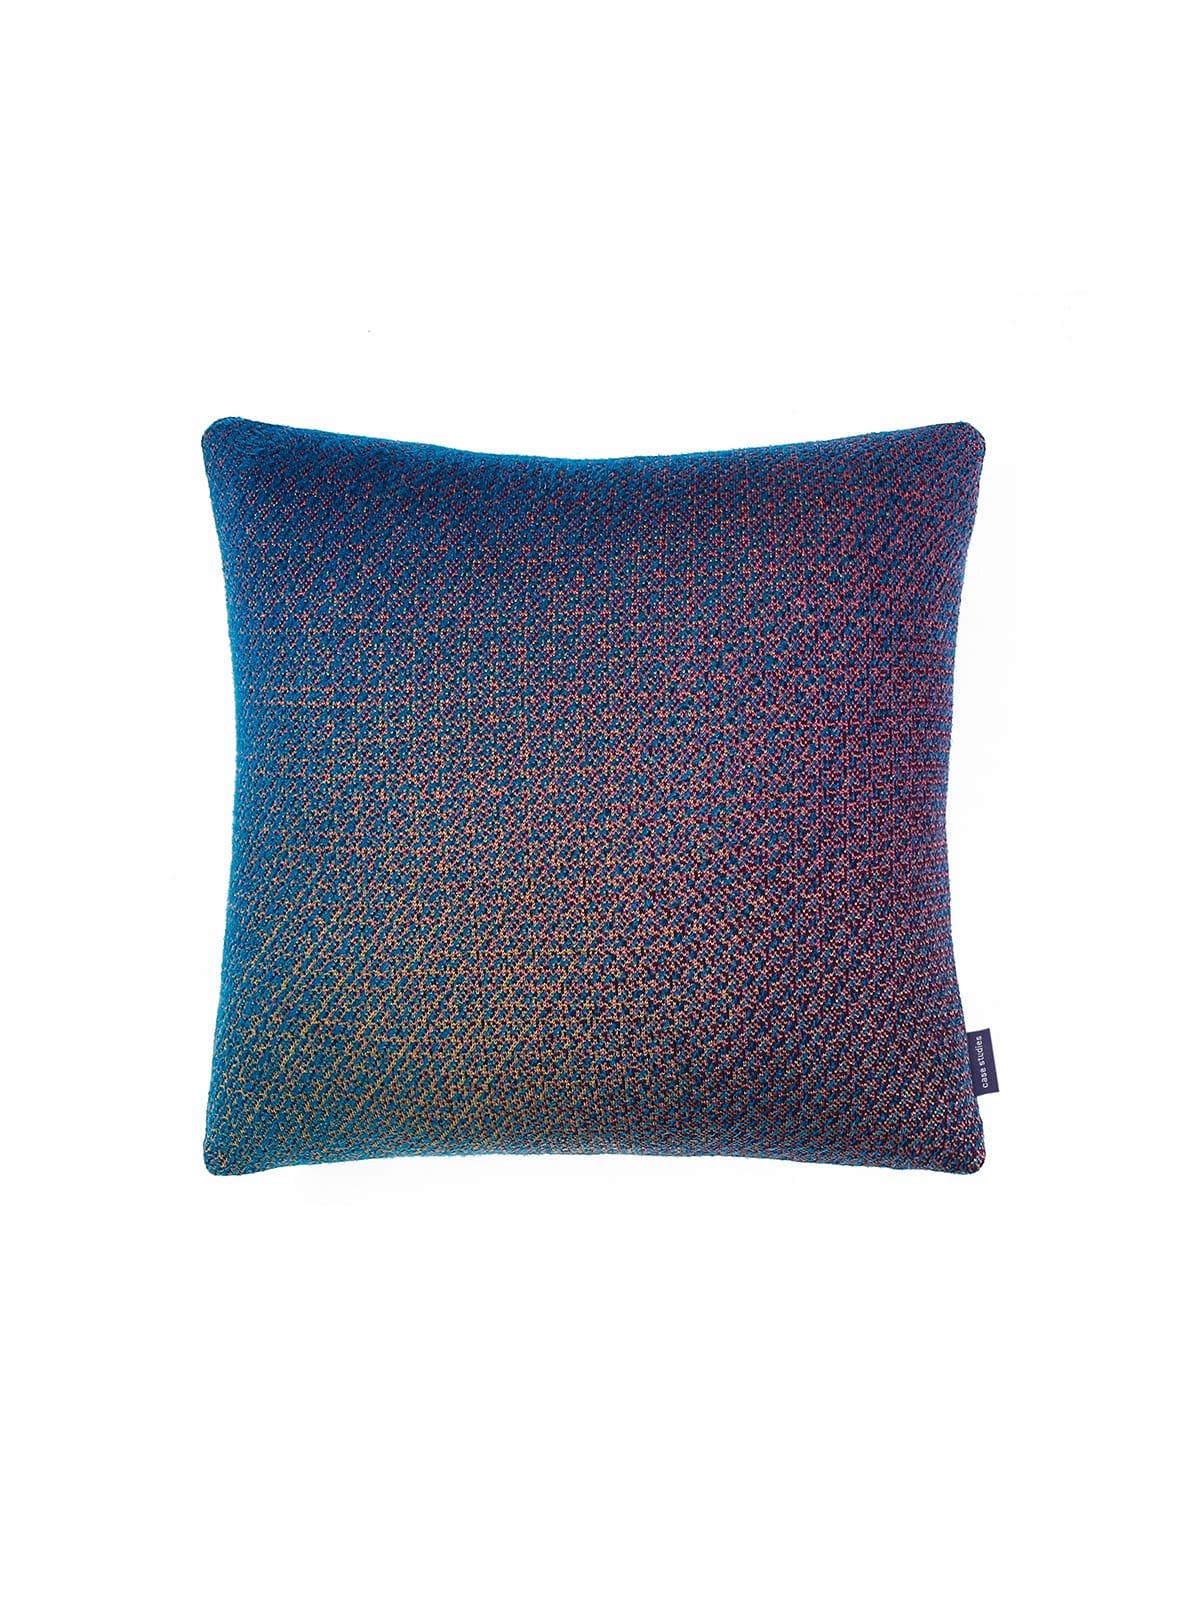 Knitted Cushion 50x50 Paris - Merino Wool